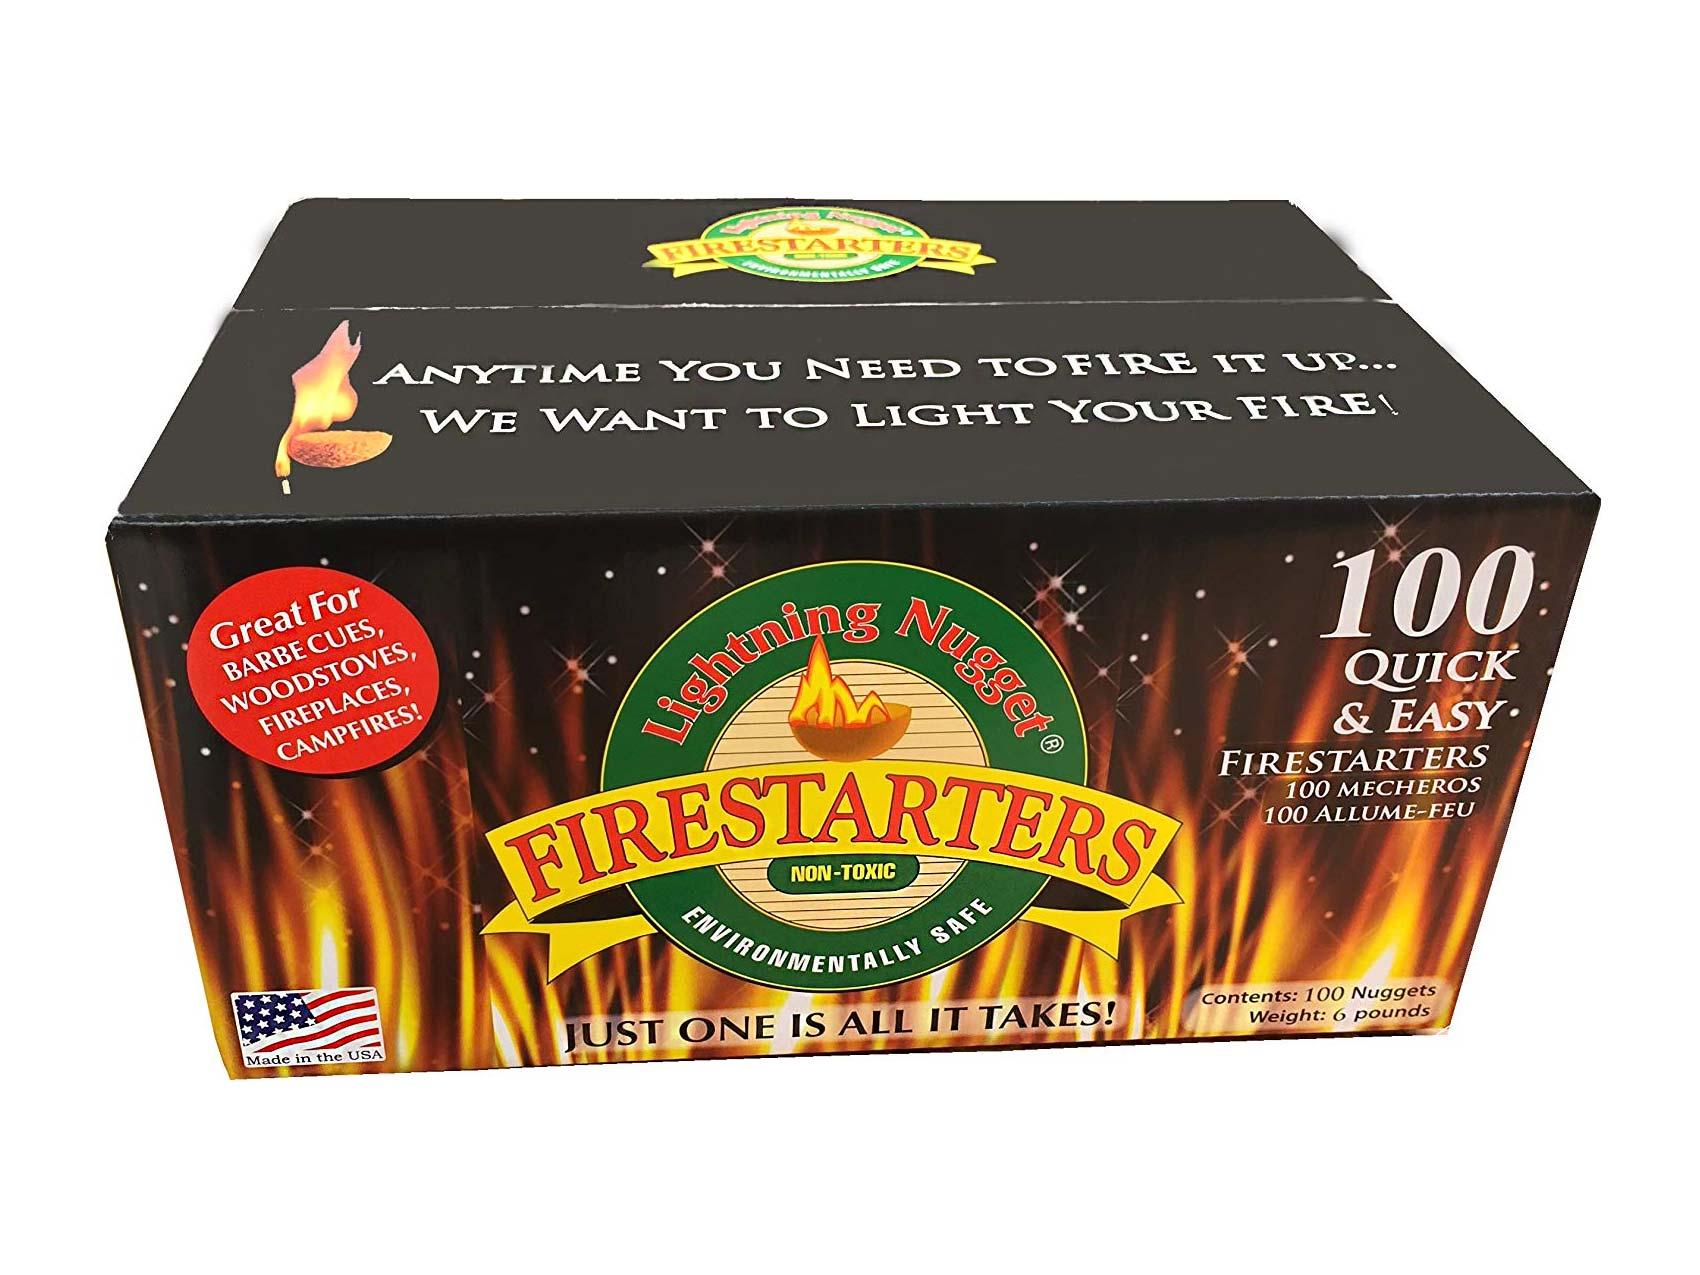 Firestarter logs